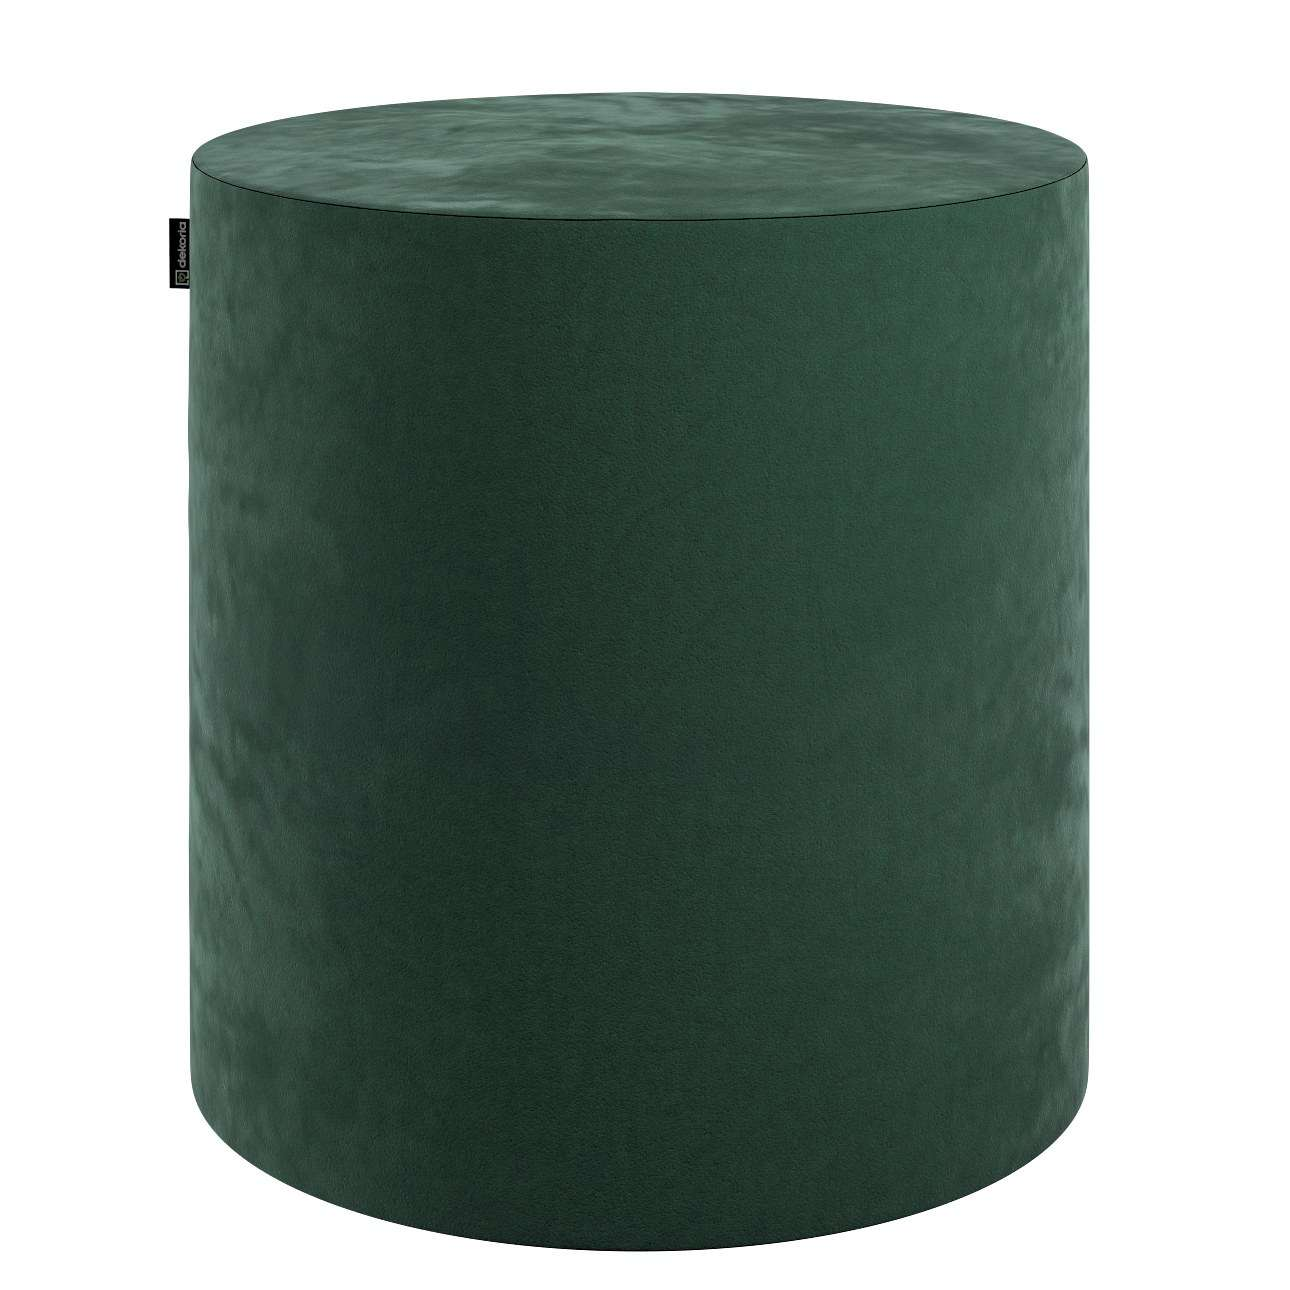 Pouf Barrel, dunkelgrün, ø40 × 40 cm, Velvet | Wohnzimmer > Hocker & Poufs > Poufs | Stoff | Dekoria